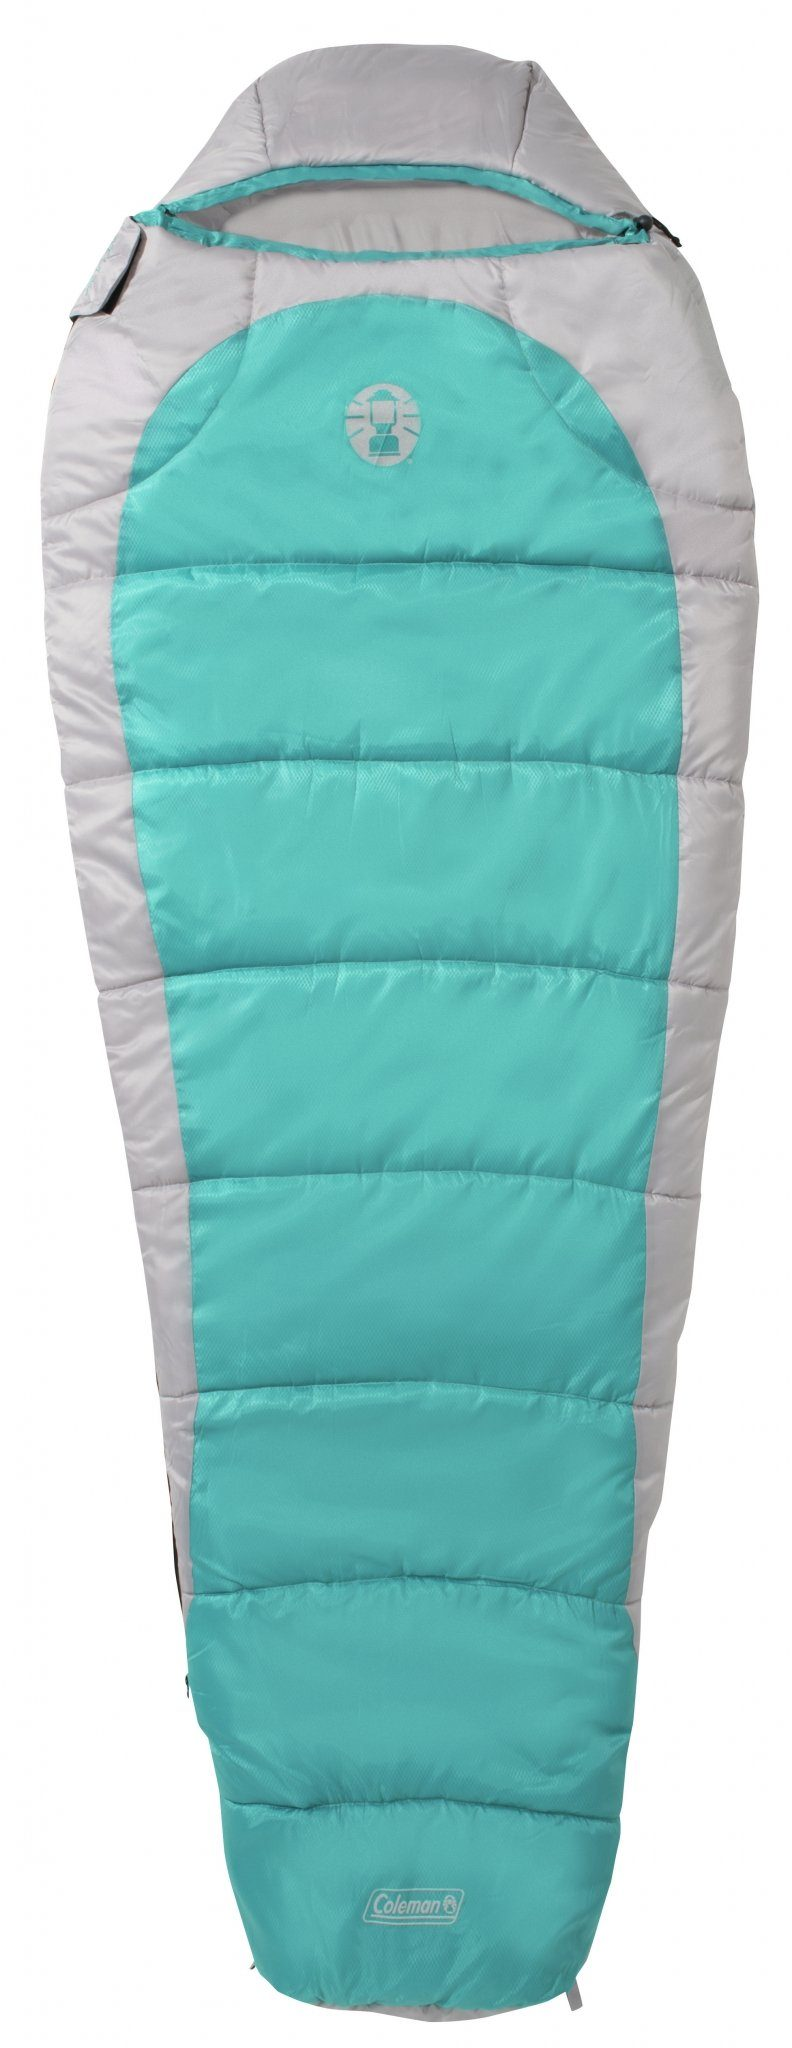 COLEMAN Schlafsack »Silverton 350 Sleeping Bag«